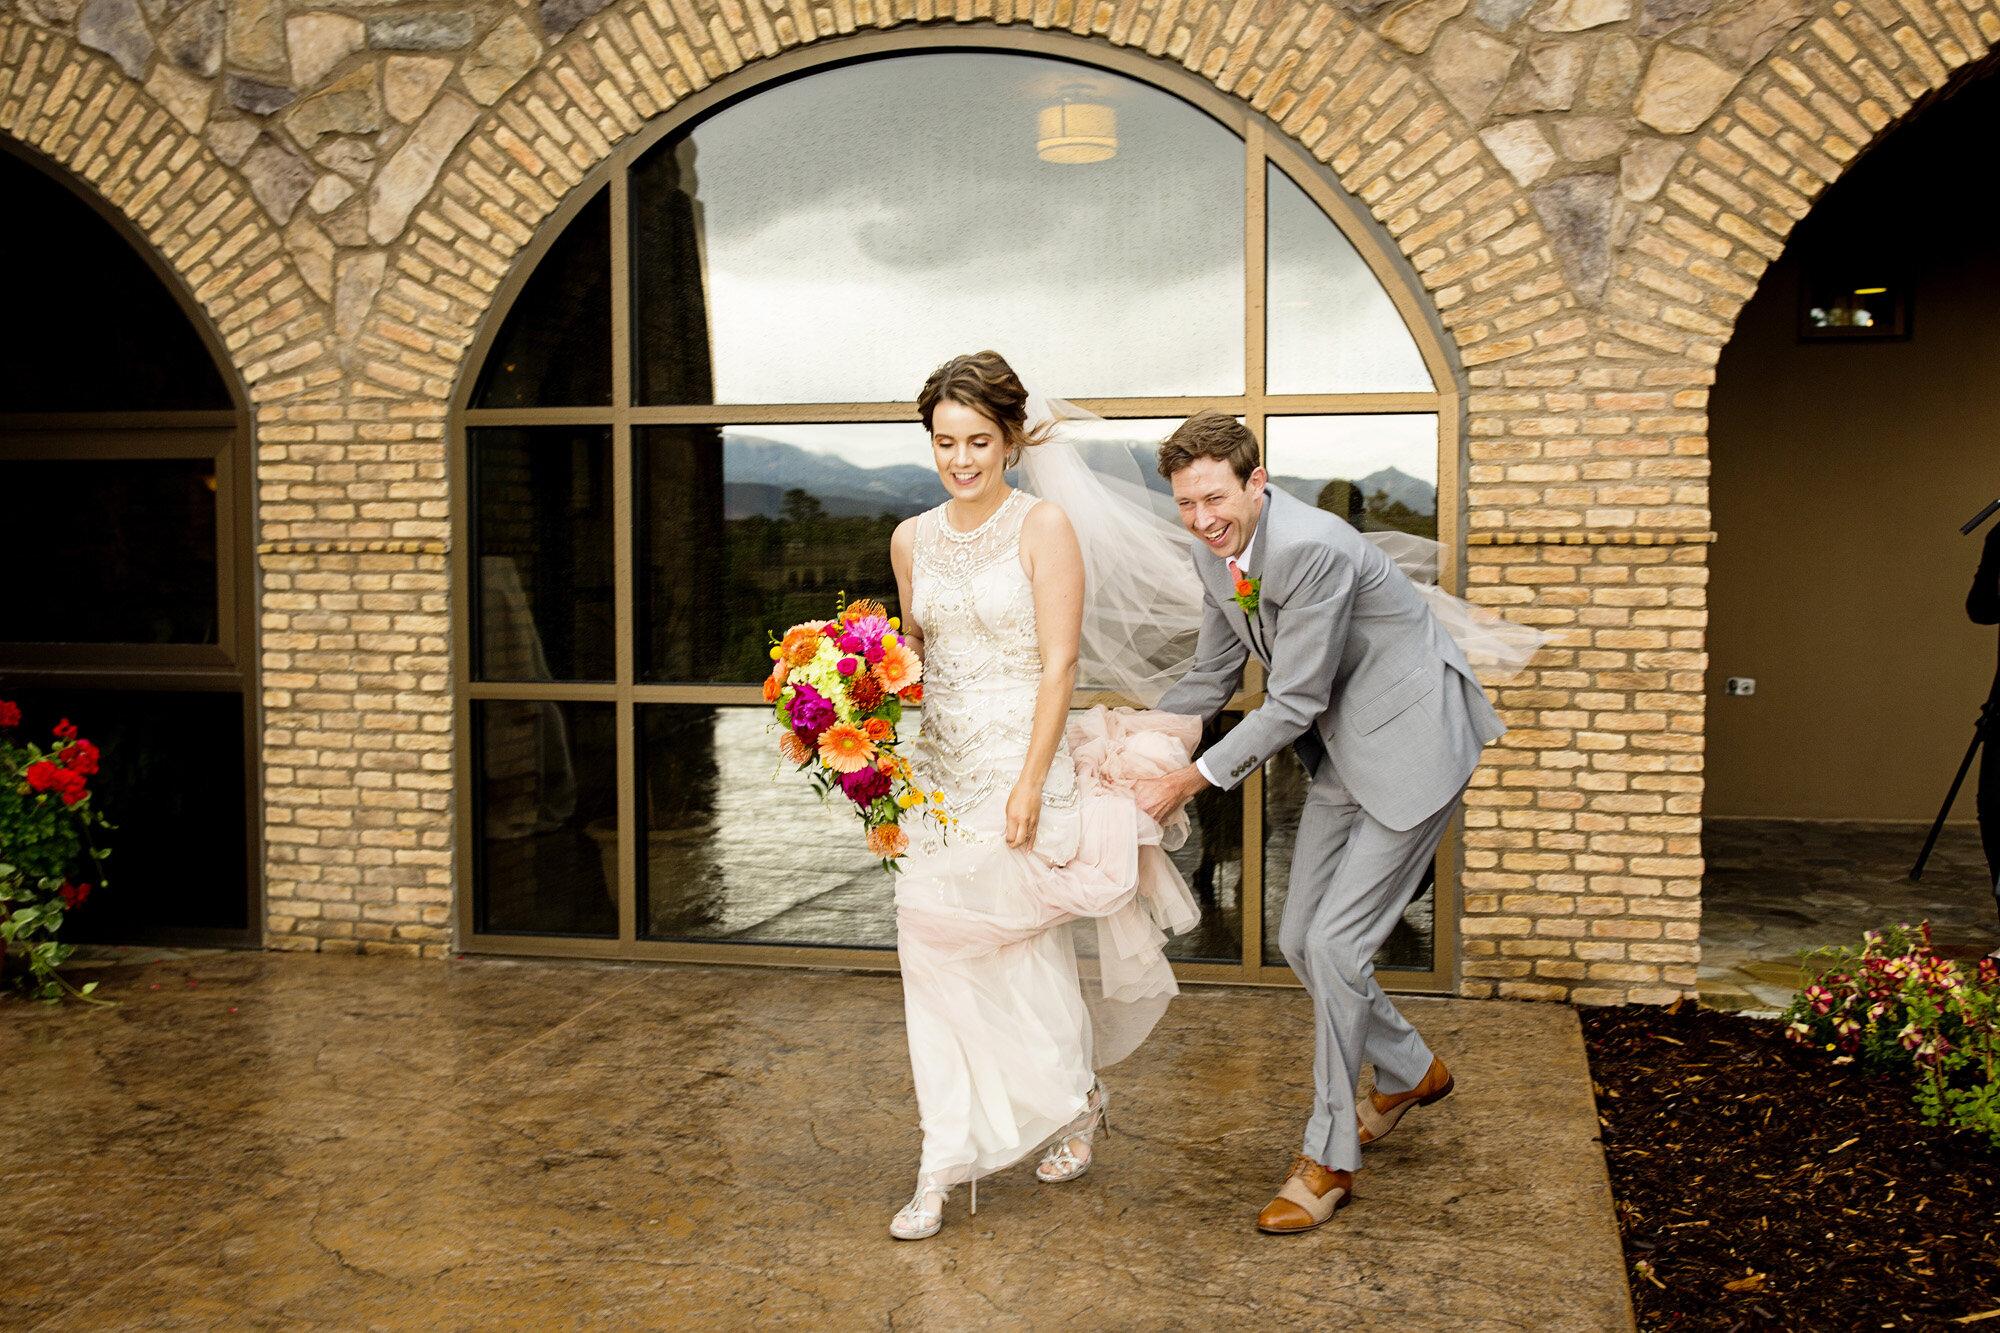 Seriously_Sabrina_Photography_Colorado_Springs_Club_at_Flying_Horse_Destination_Wedding_ODwyer36.jpg